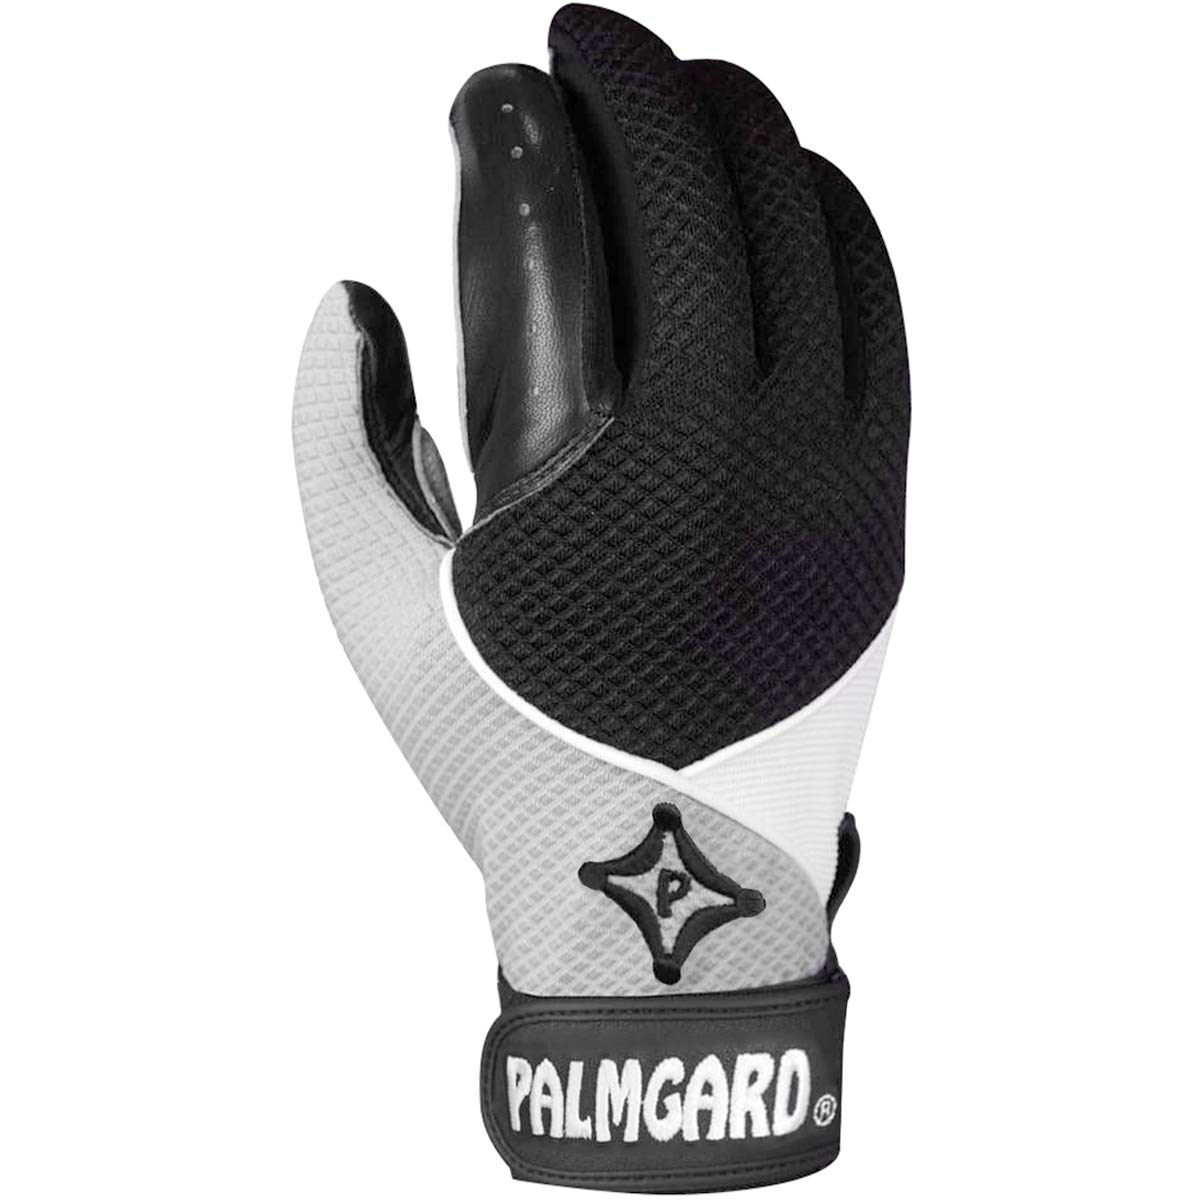 Palmgard Youth Xtra Protective Inner Glove by Palmgard